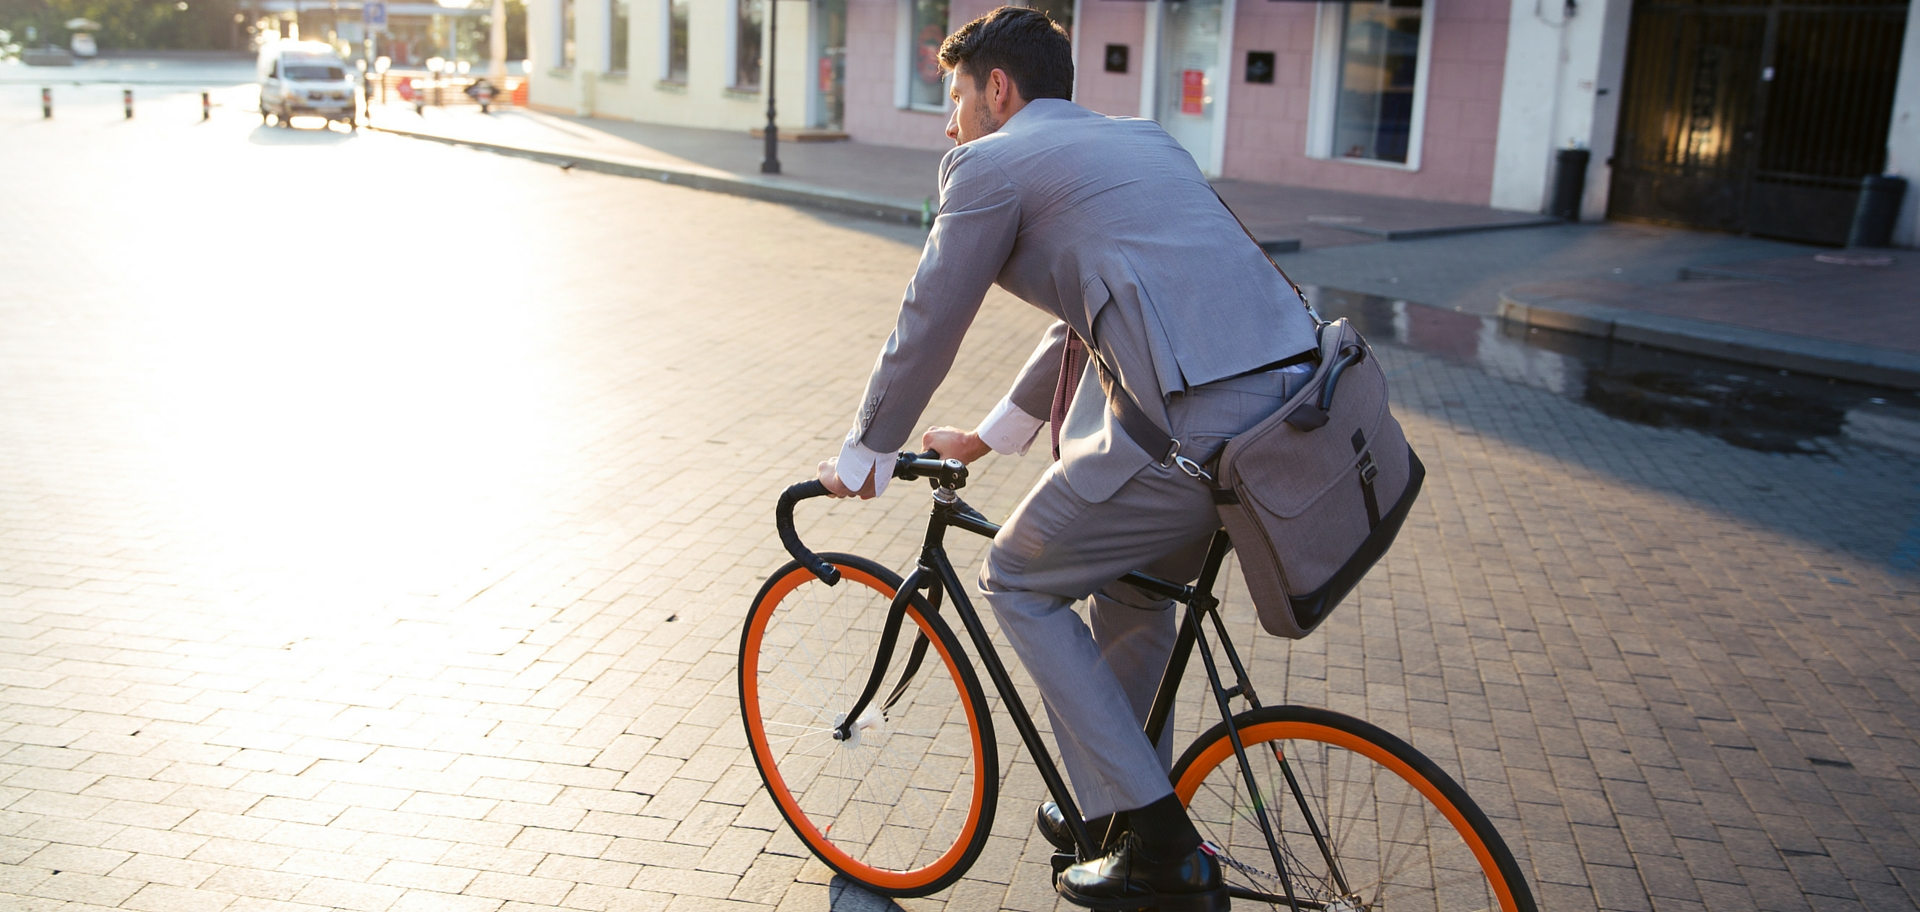 National Bike to Work Day